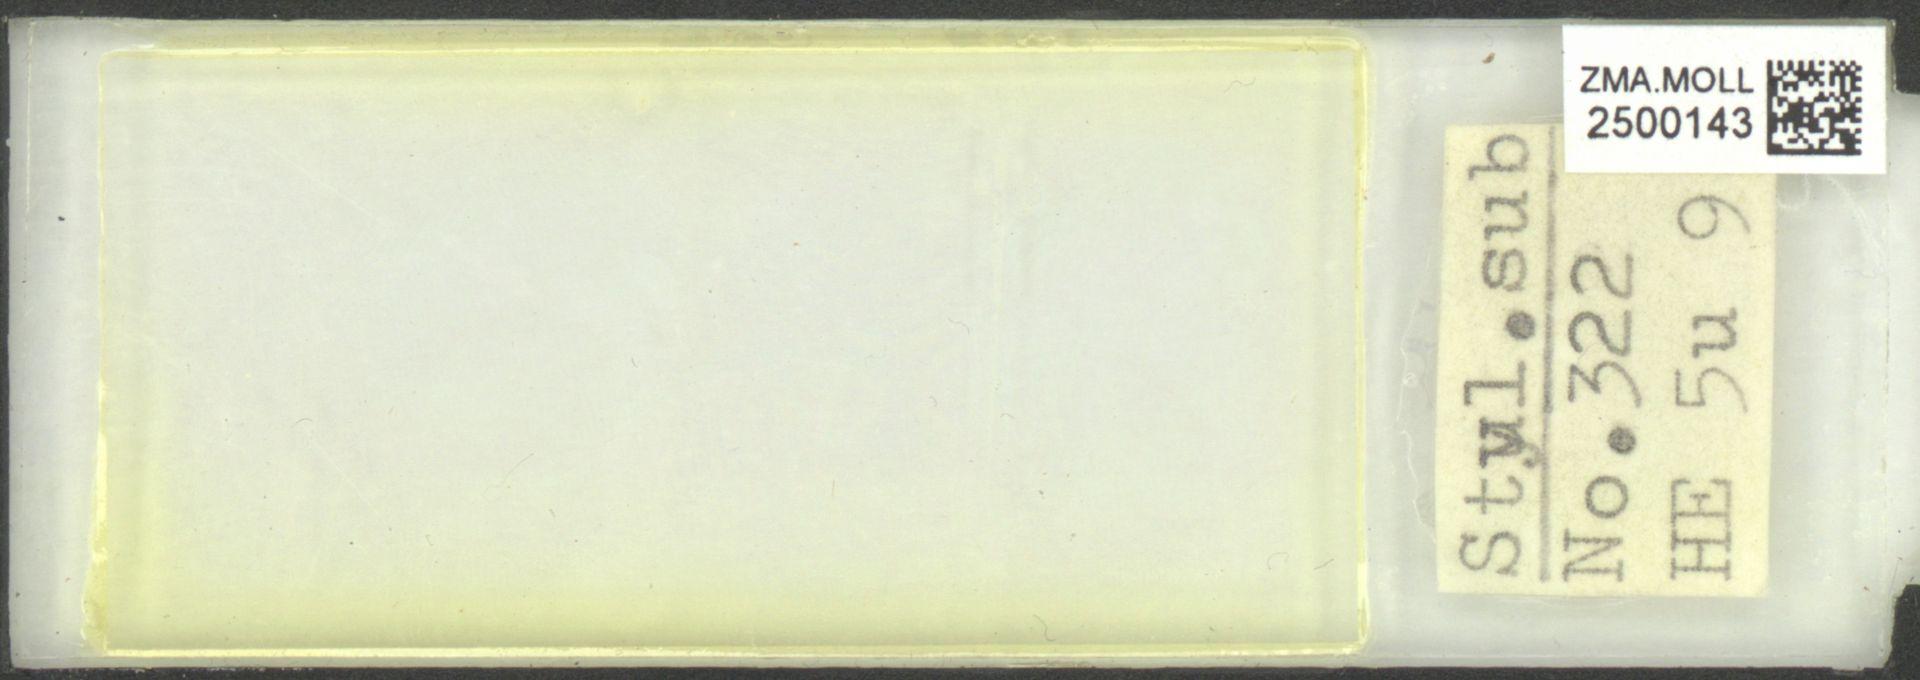 ZMA.MOLL.2500143 | Styliola subula (Quoy & Gaimard, 1827)